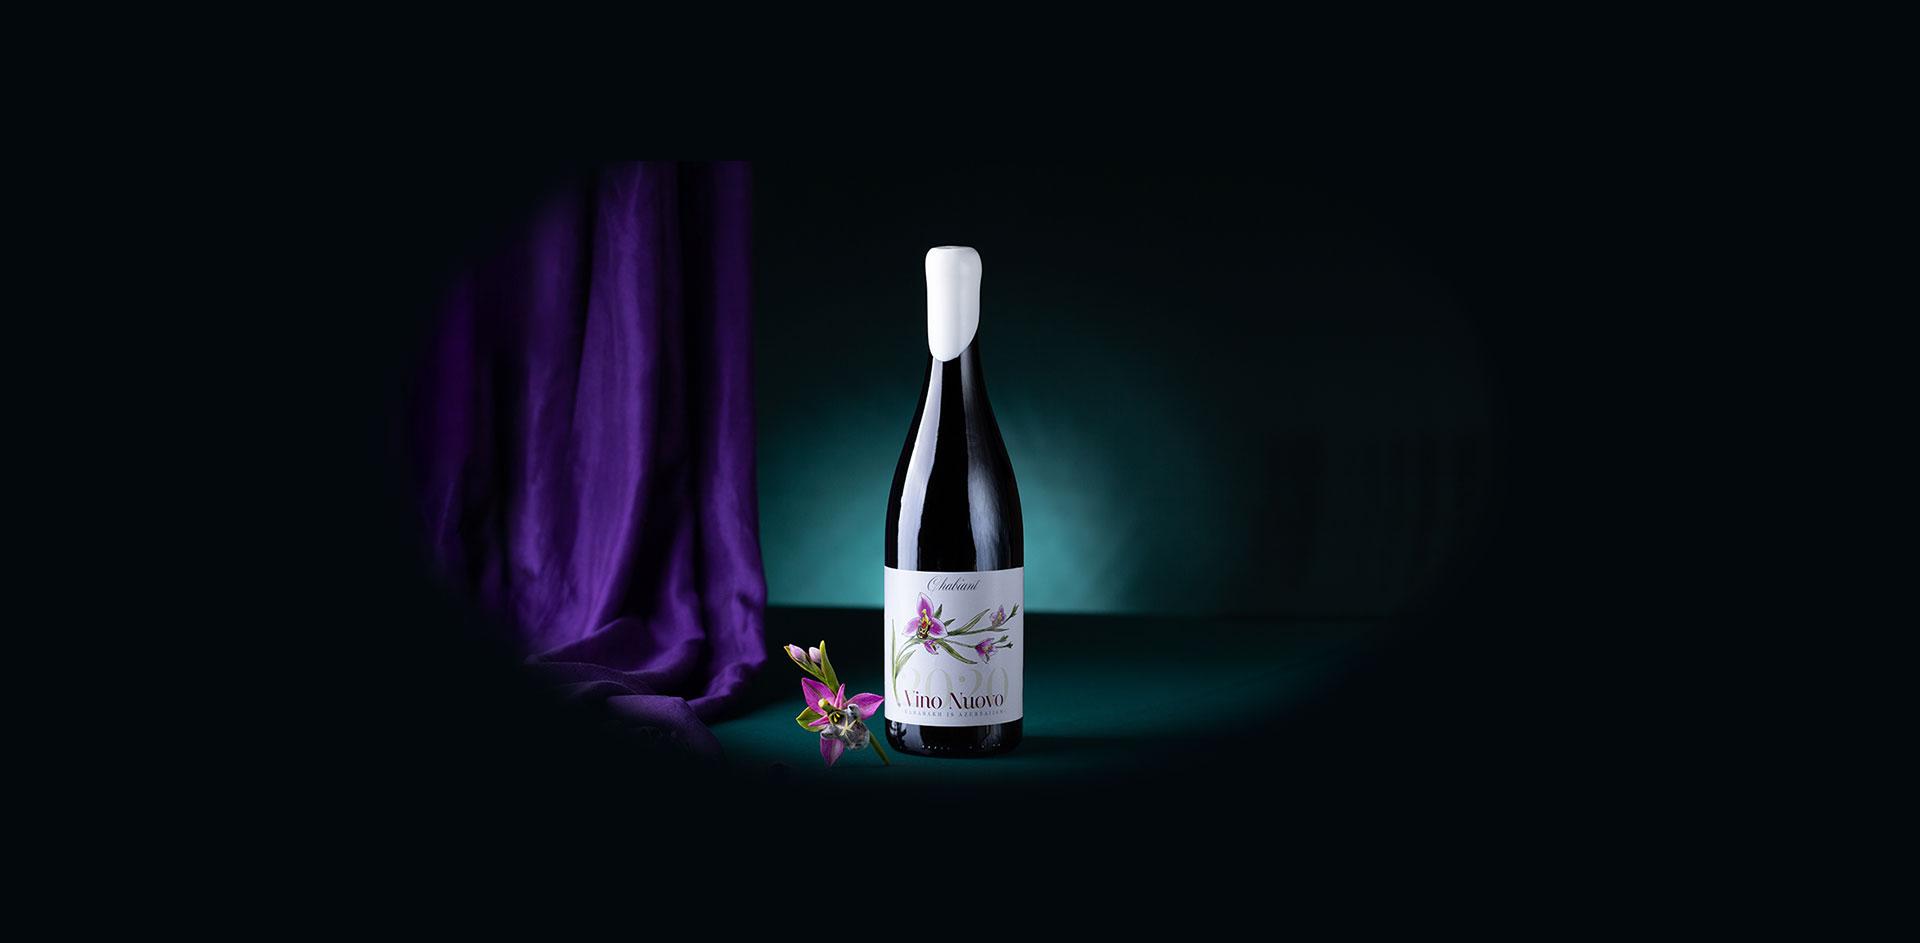 Chabiant.az Вебсайт винного бренда Chabiant и винодельни Ismayilli Sharab-2